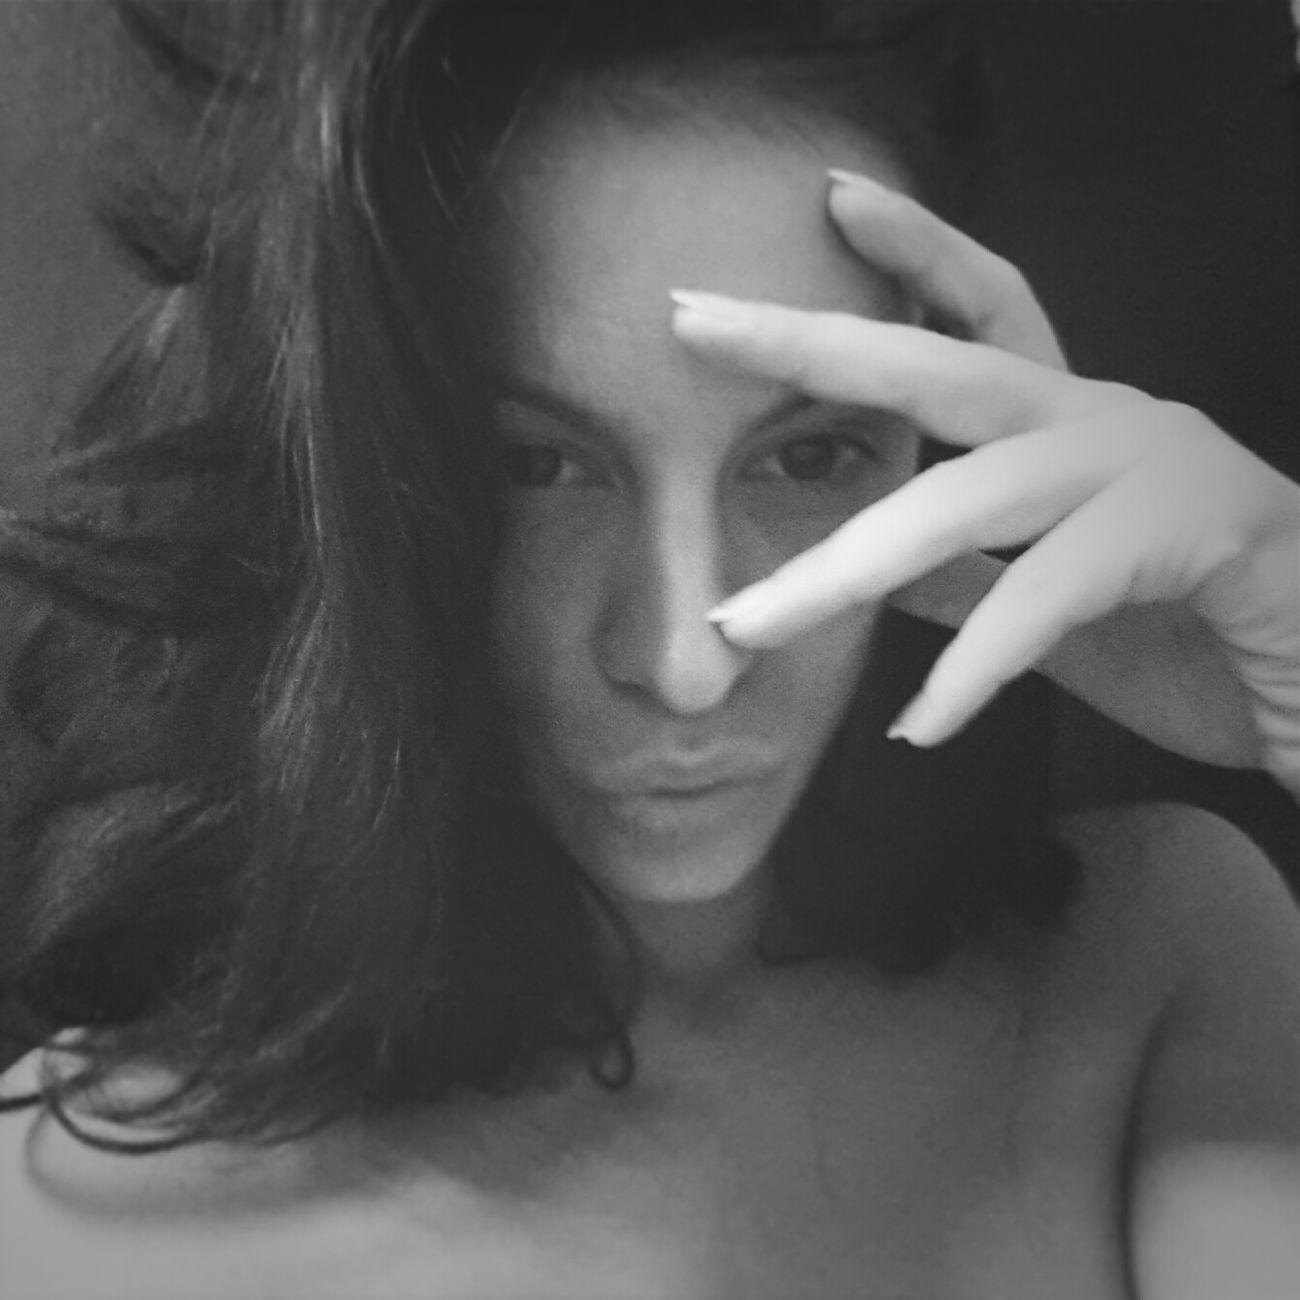 Blackandwhite Selfie